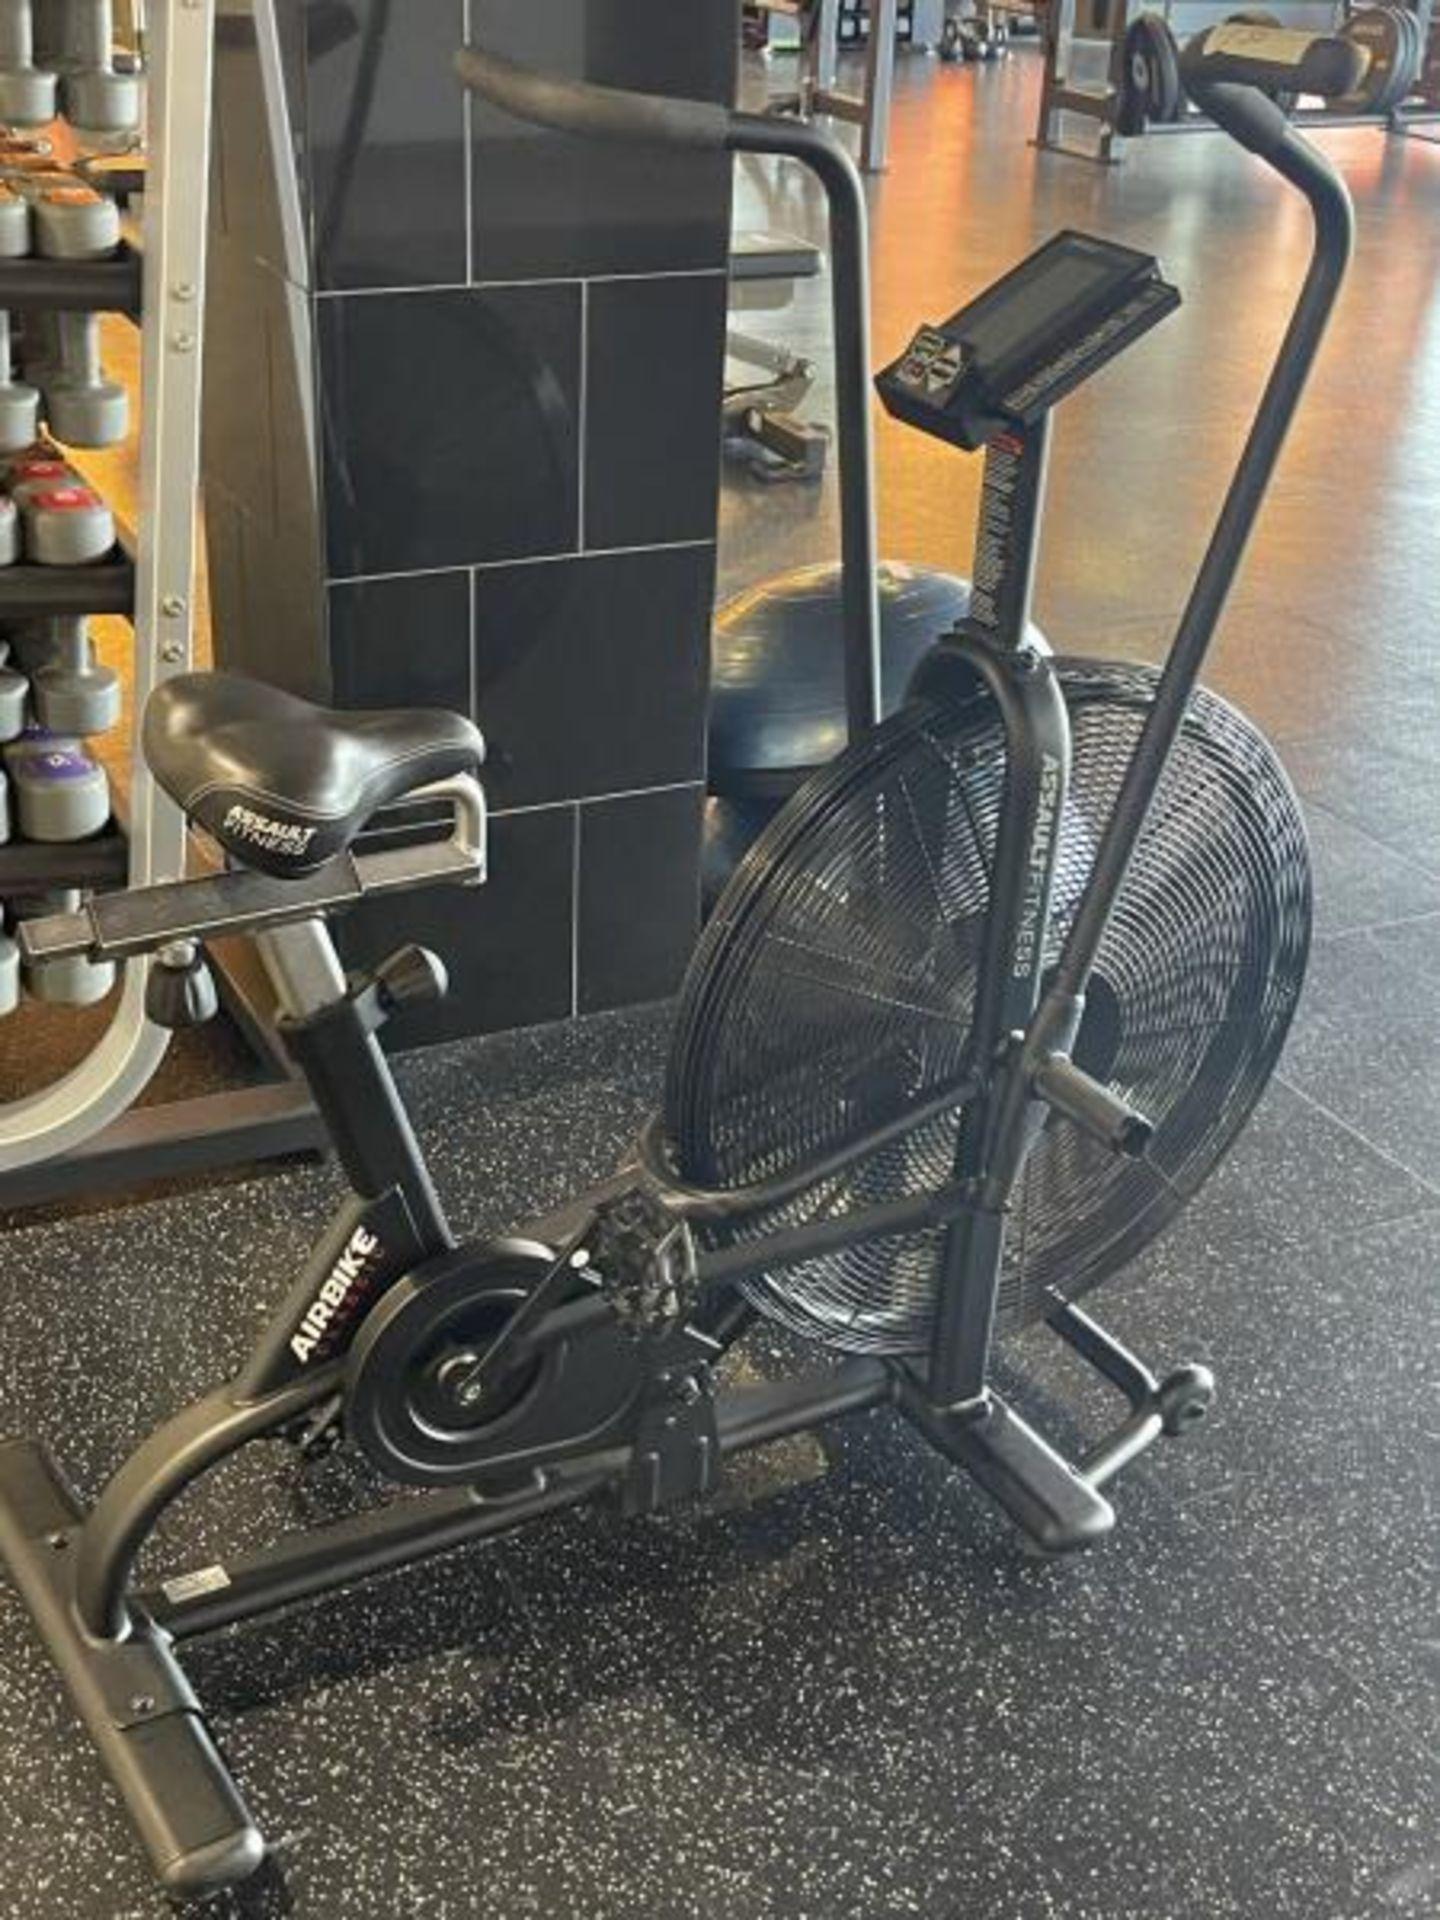 Assault Fitness Air Bike M: ASSAULTAIRBIKE